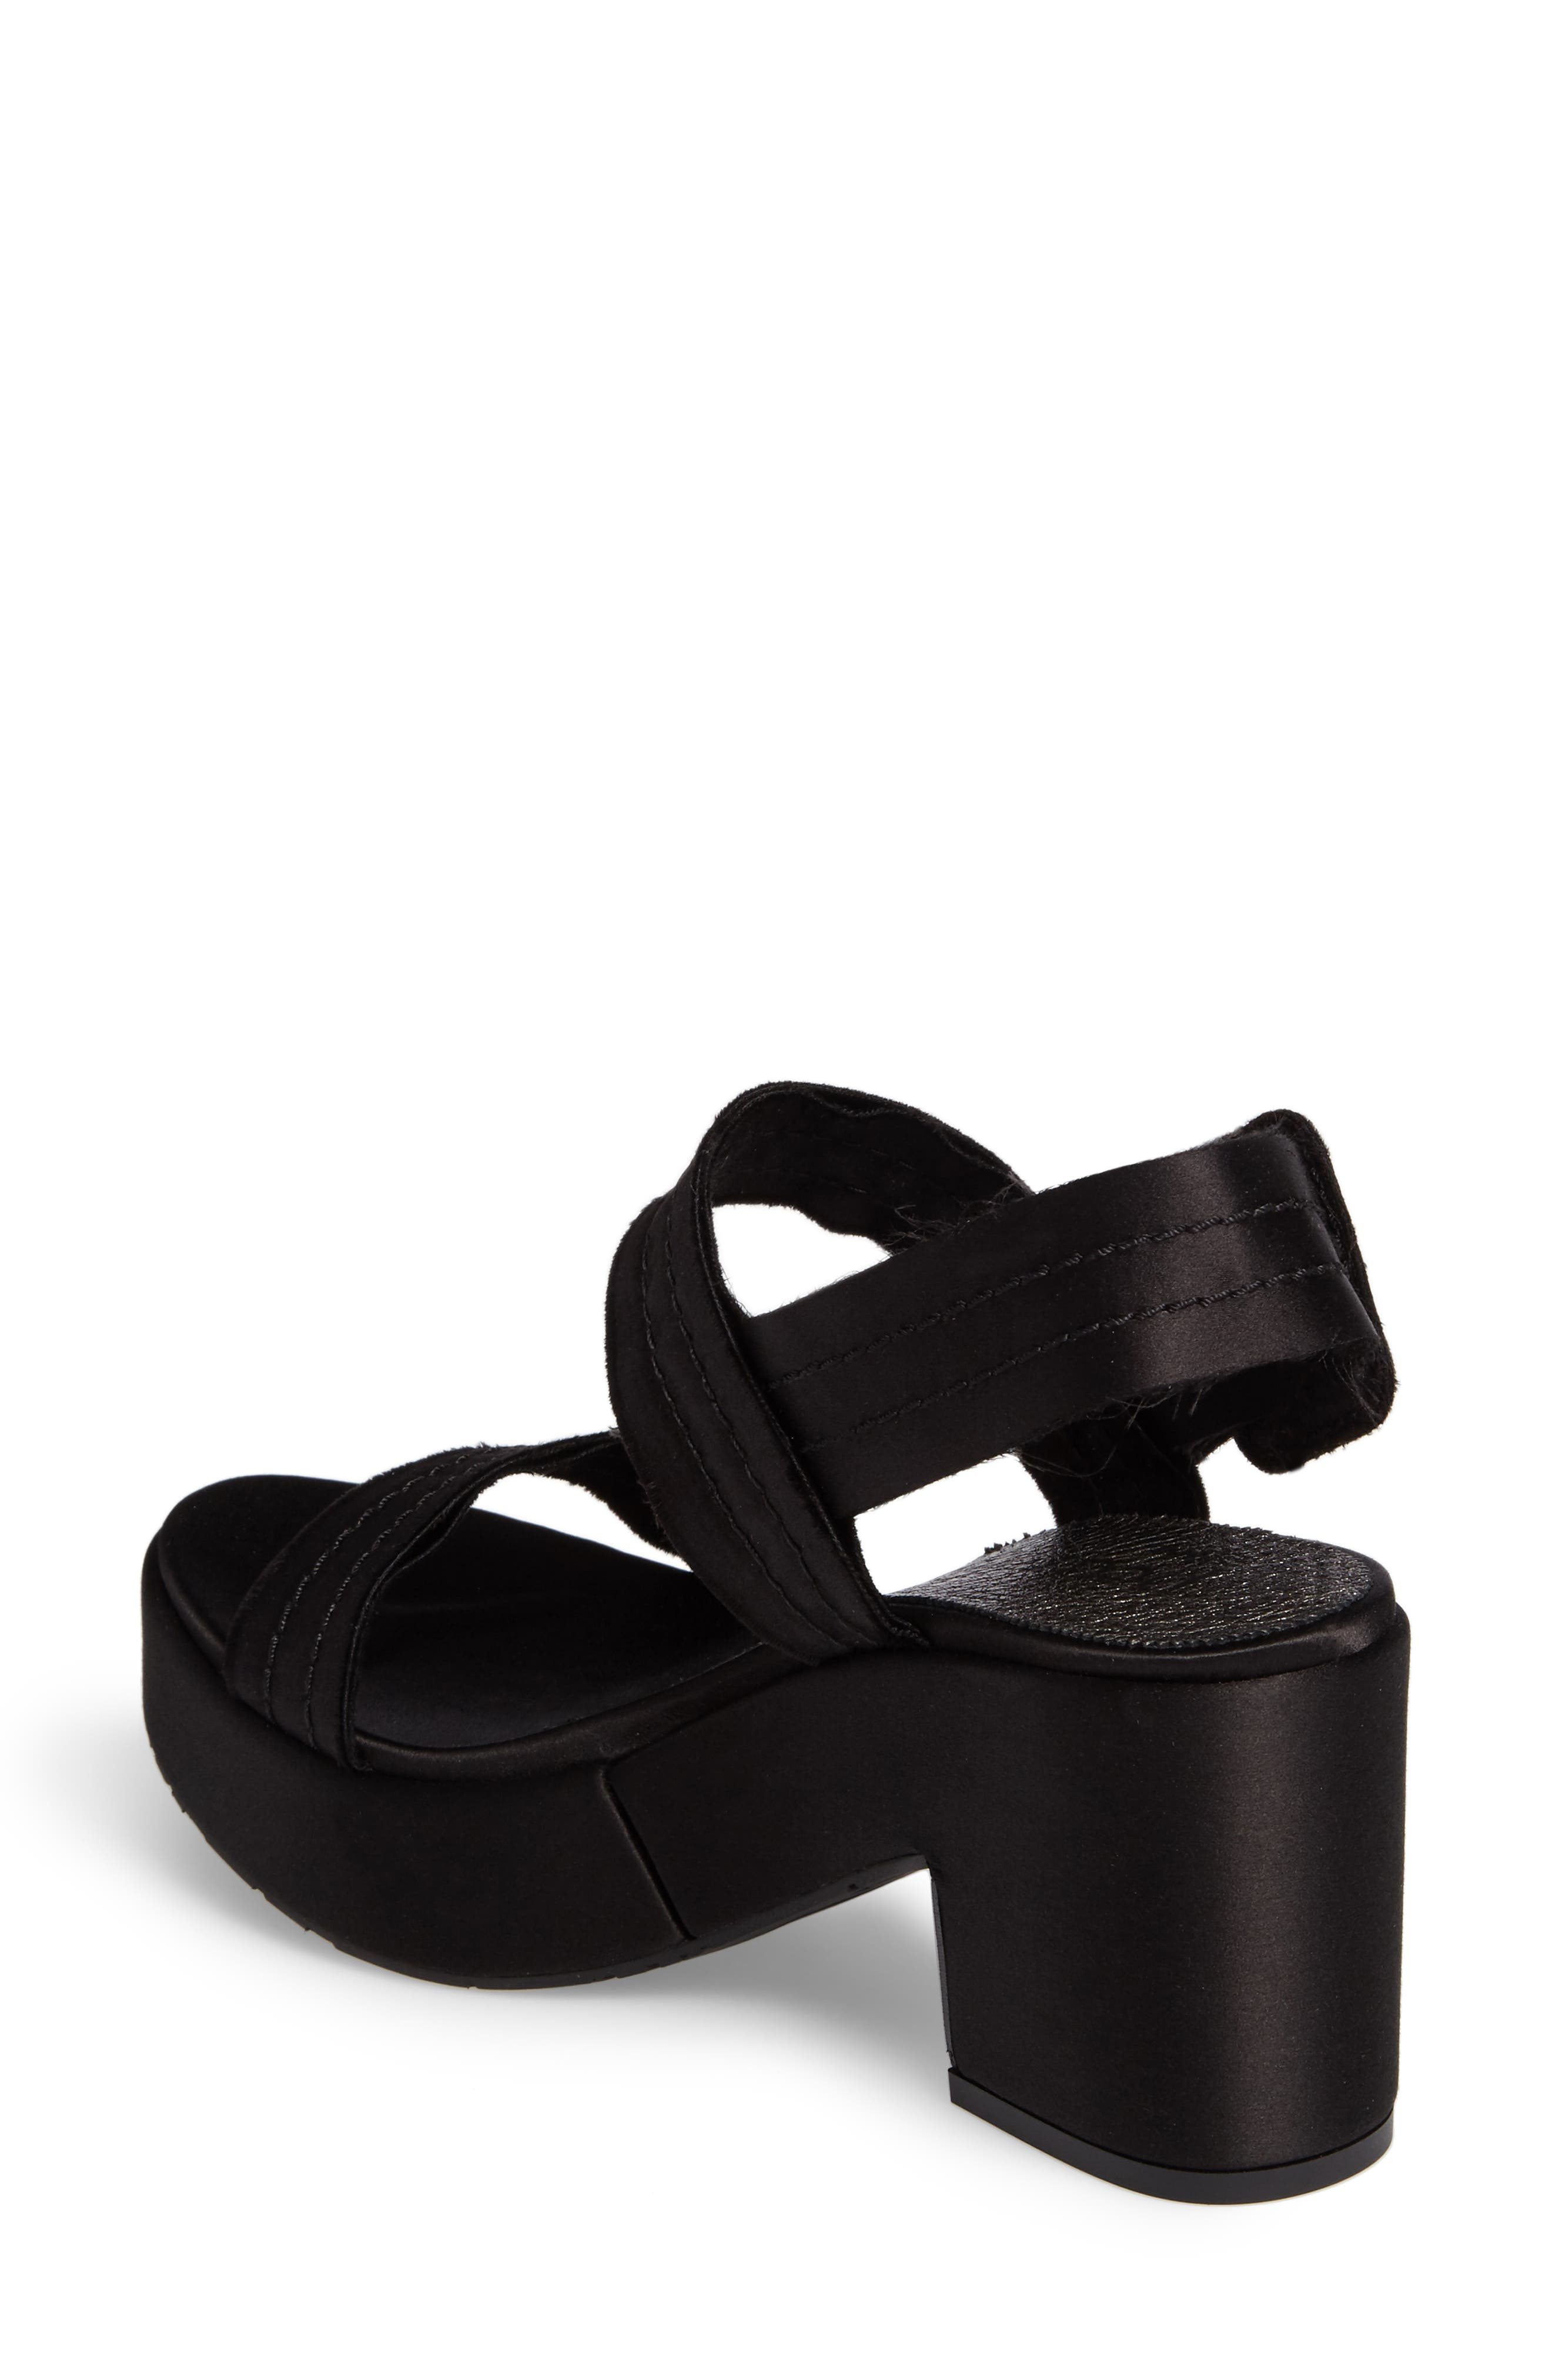 Decima Platform Sandal,                             Alternate thumbnail 2, color,                             001